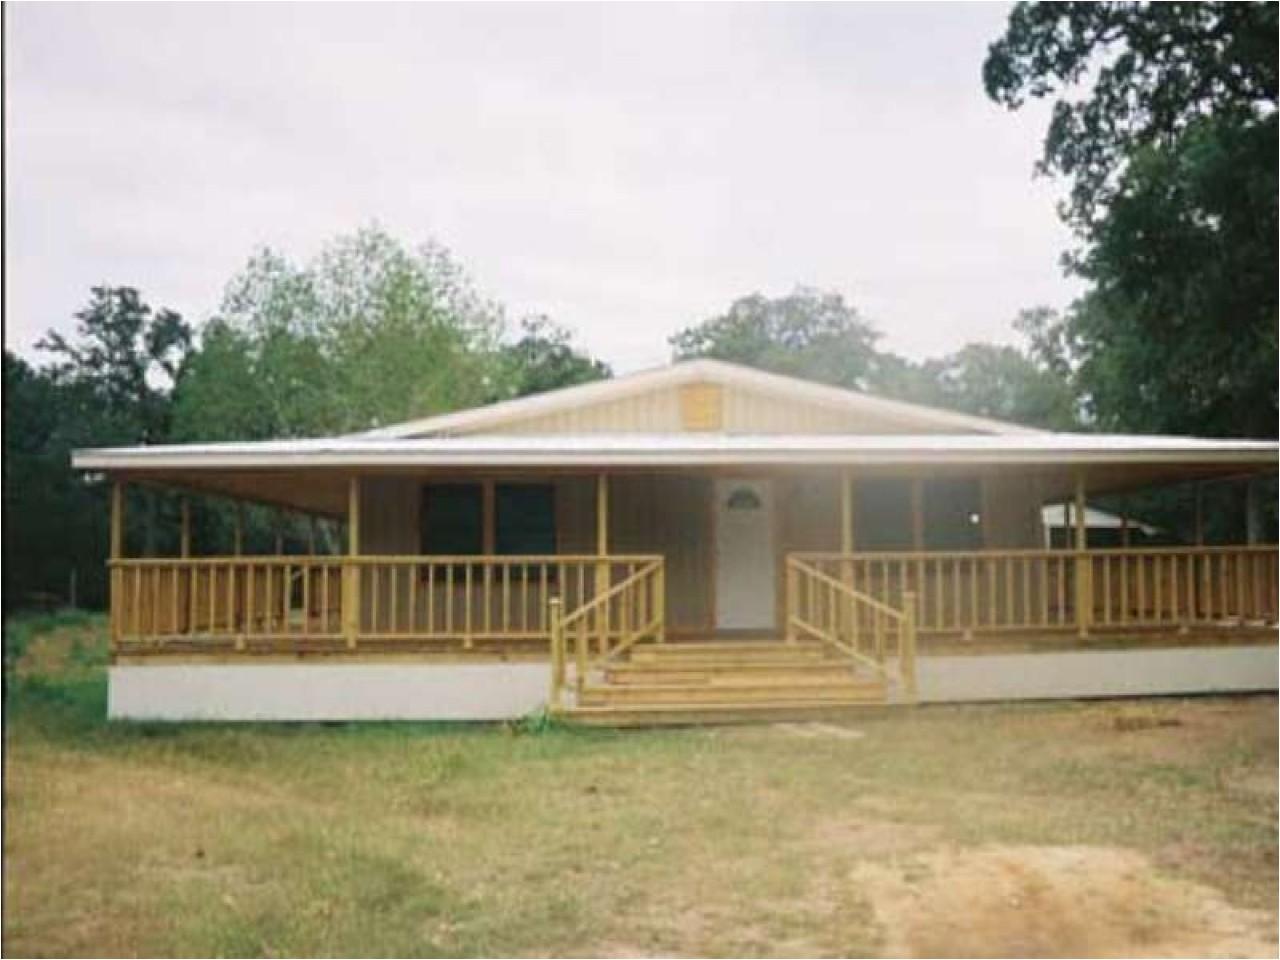 183dd689f3b9b3d6 double wide mobile home porches used double wide mobile homes